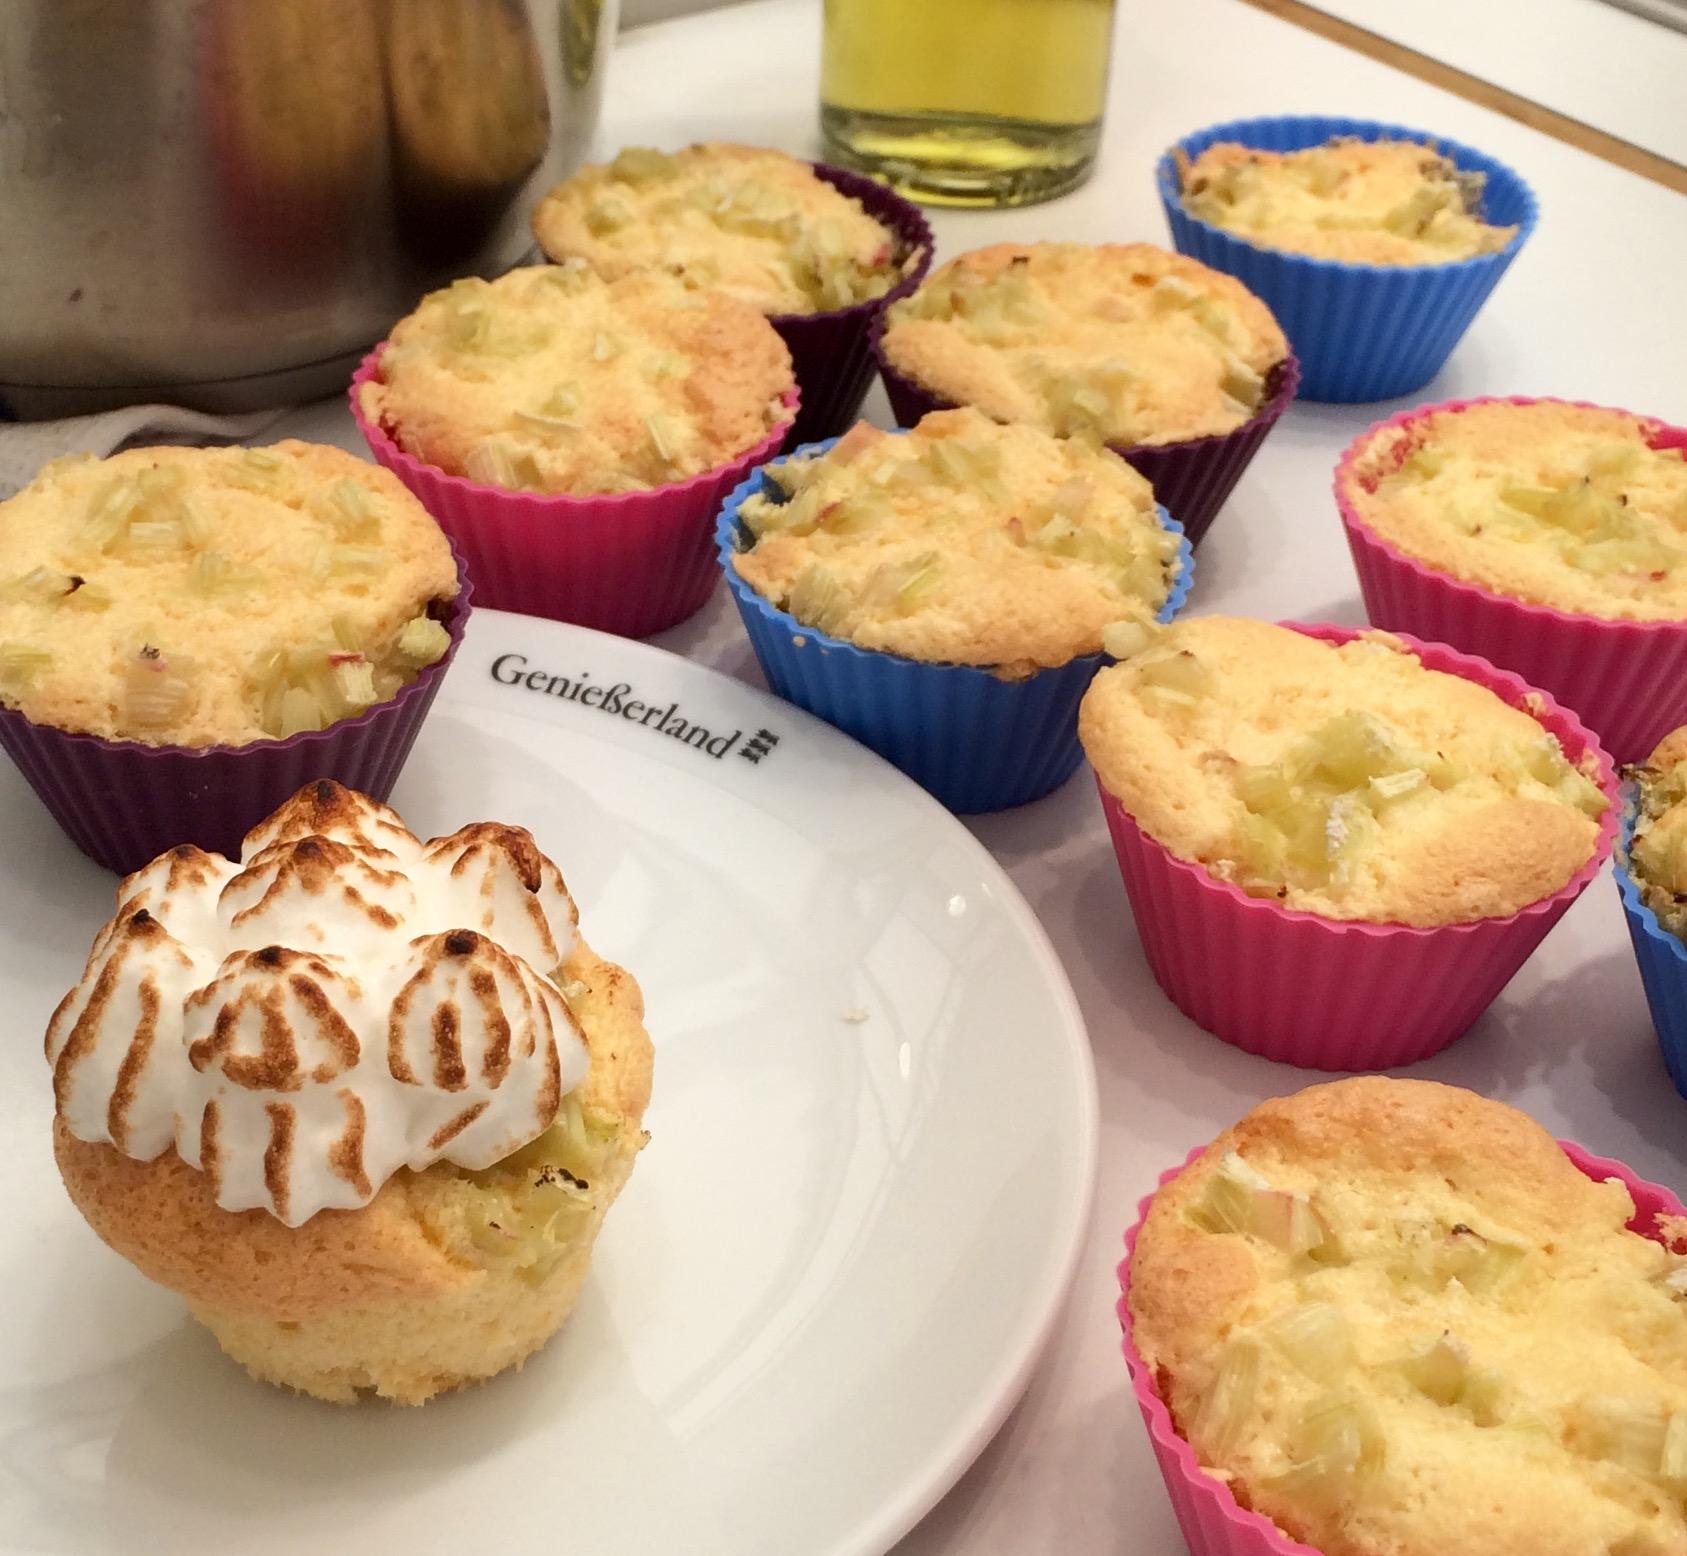 Rhabarber-Cupcakes mit flambierter Baiserhaube